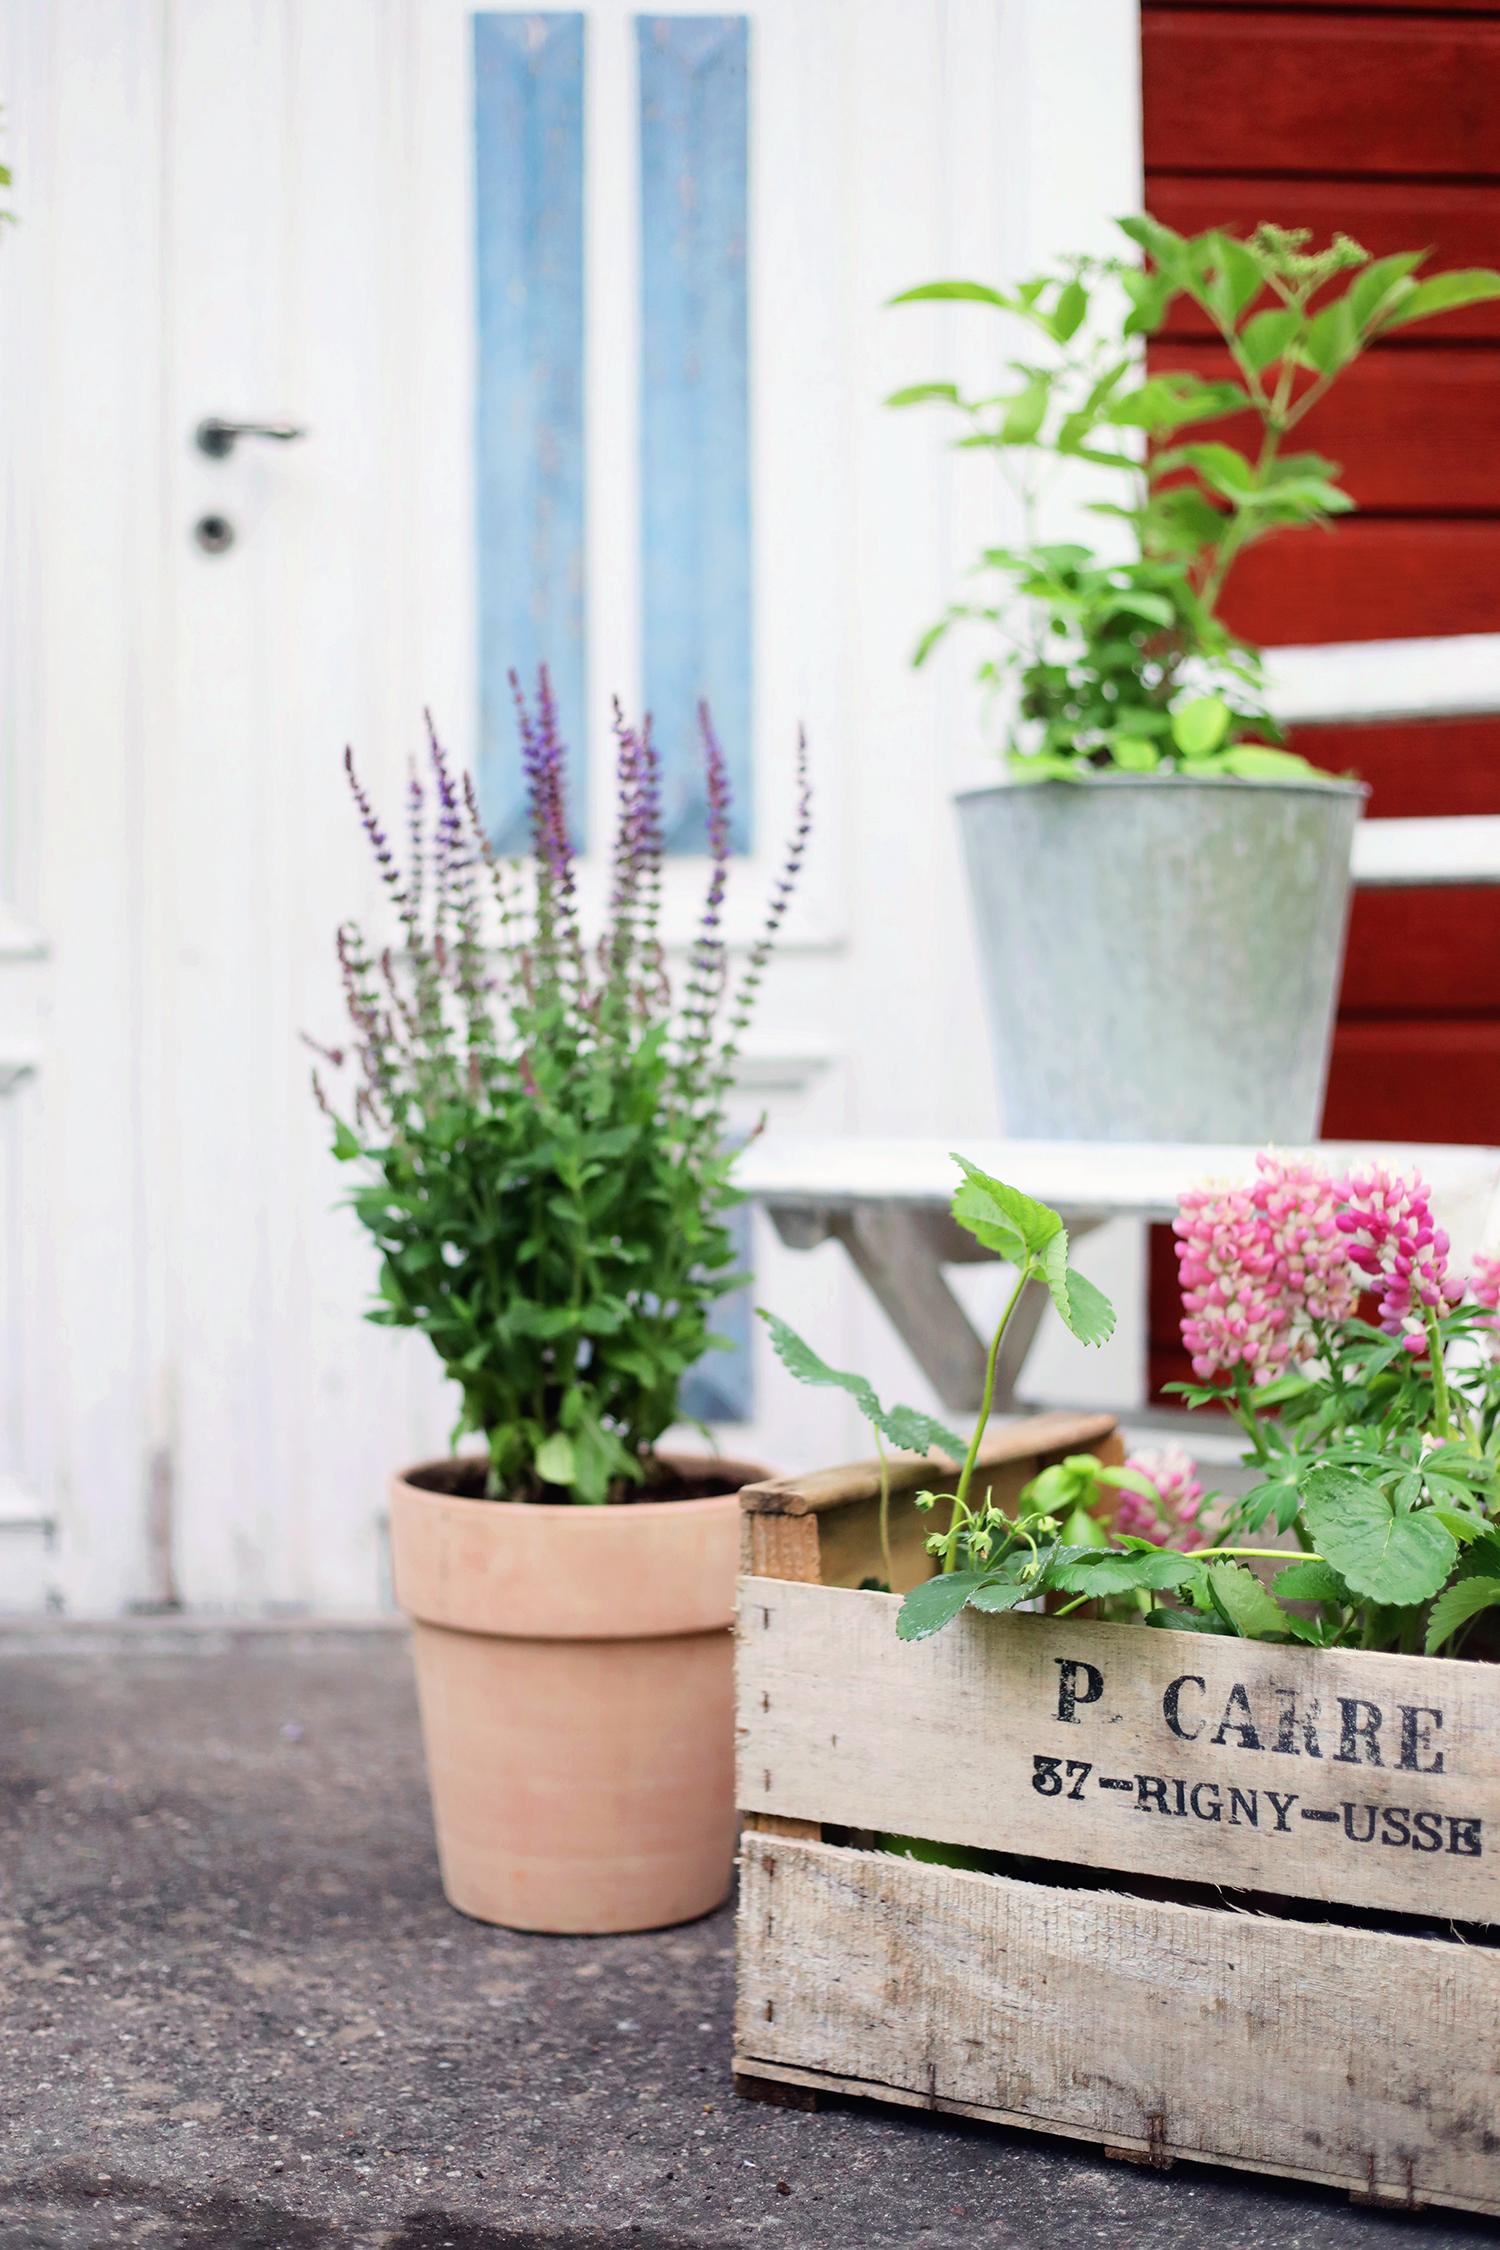 blomsterlandet gotland torp krukor odla växter trädgård barn trappa trälåda